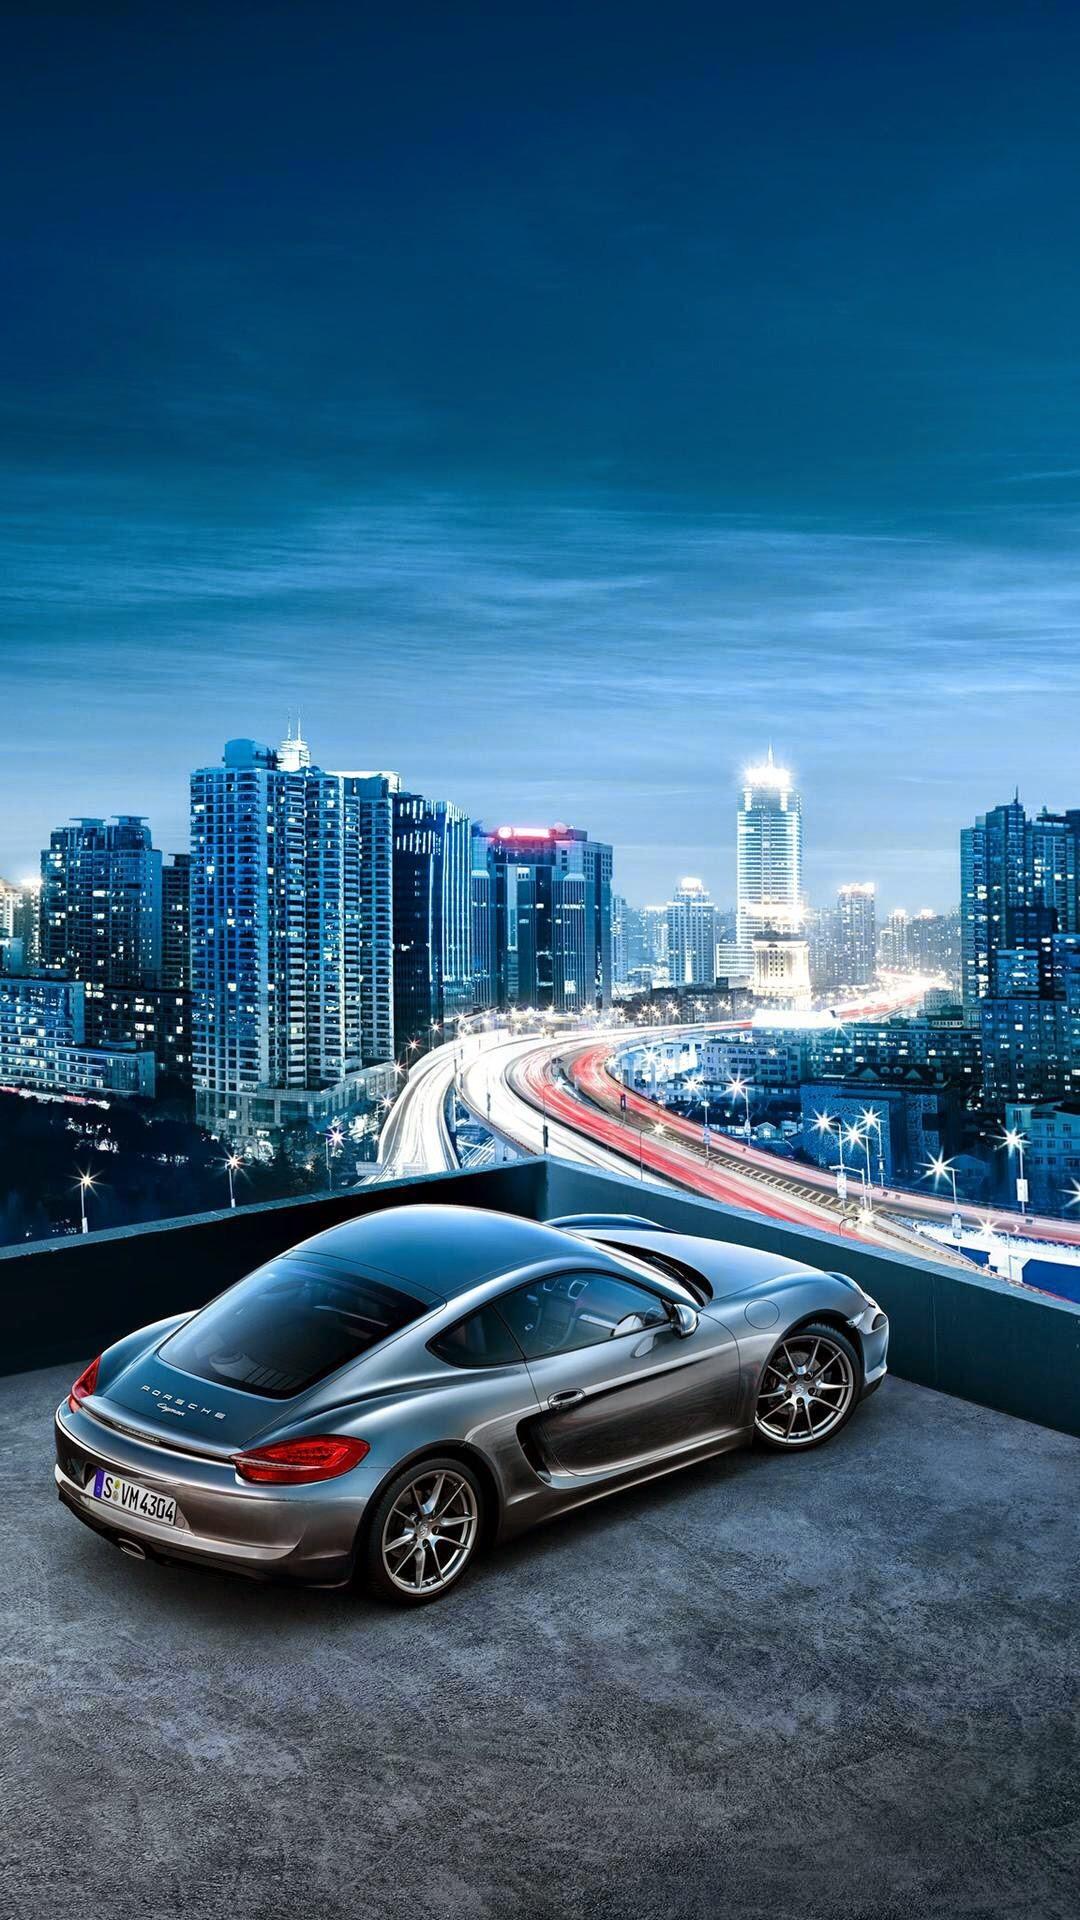 Porsche Cayman City View iPhone 6 Plus HD Wallpaper – Top 10 Cars iPhone  Wallpapers